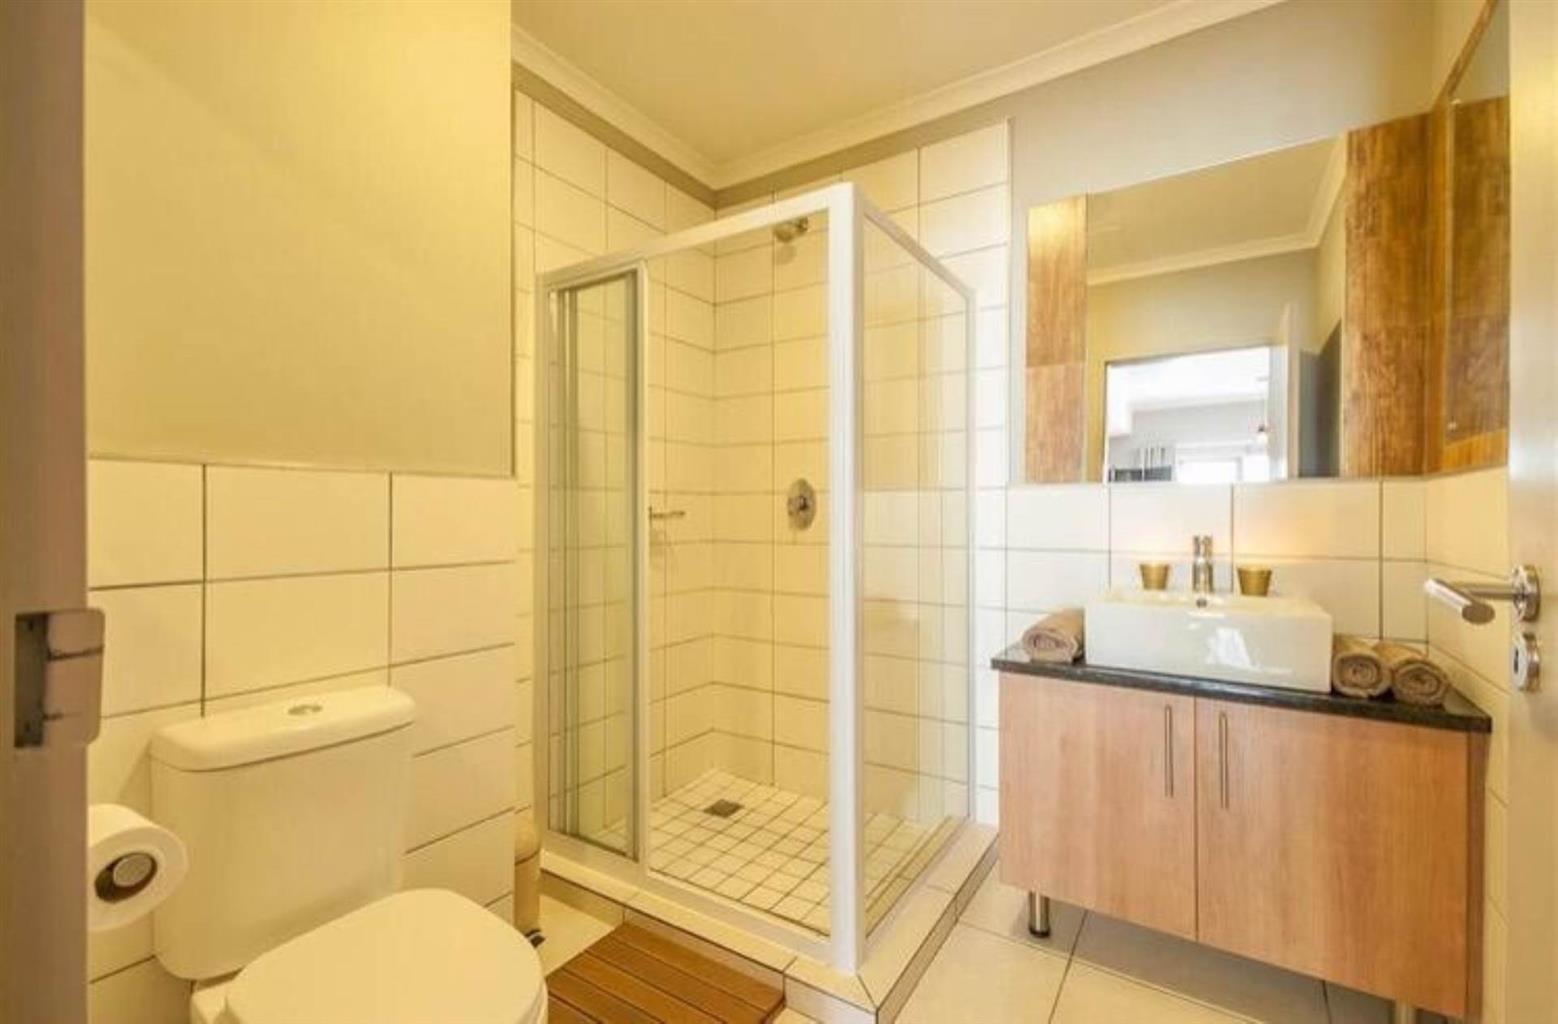 Apartment Rental Monthly in WOODSTOCK UPPER